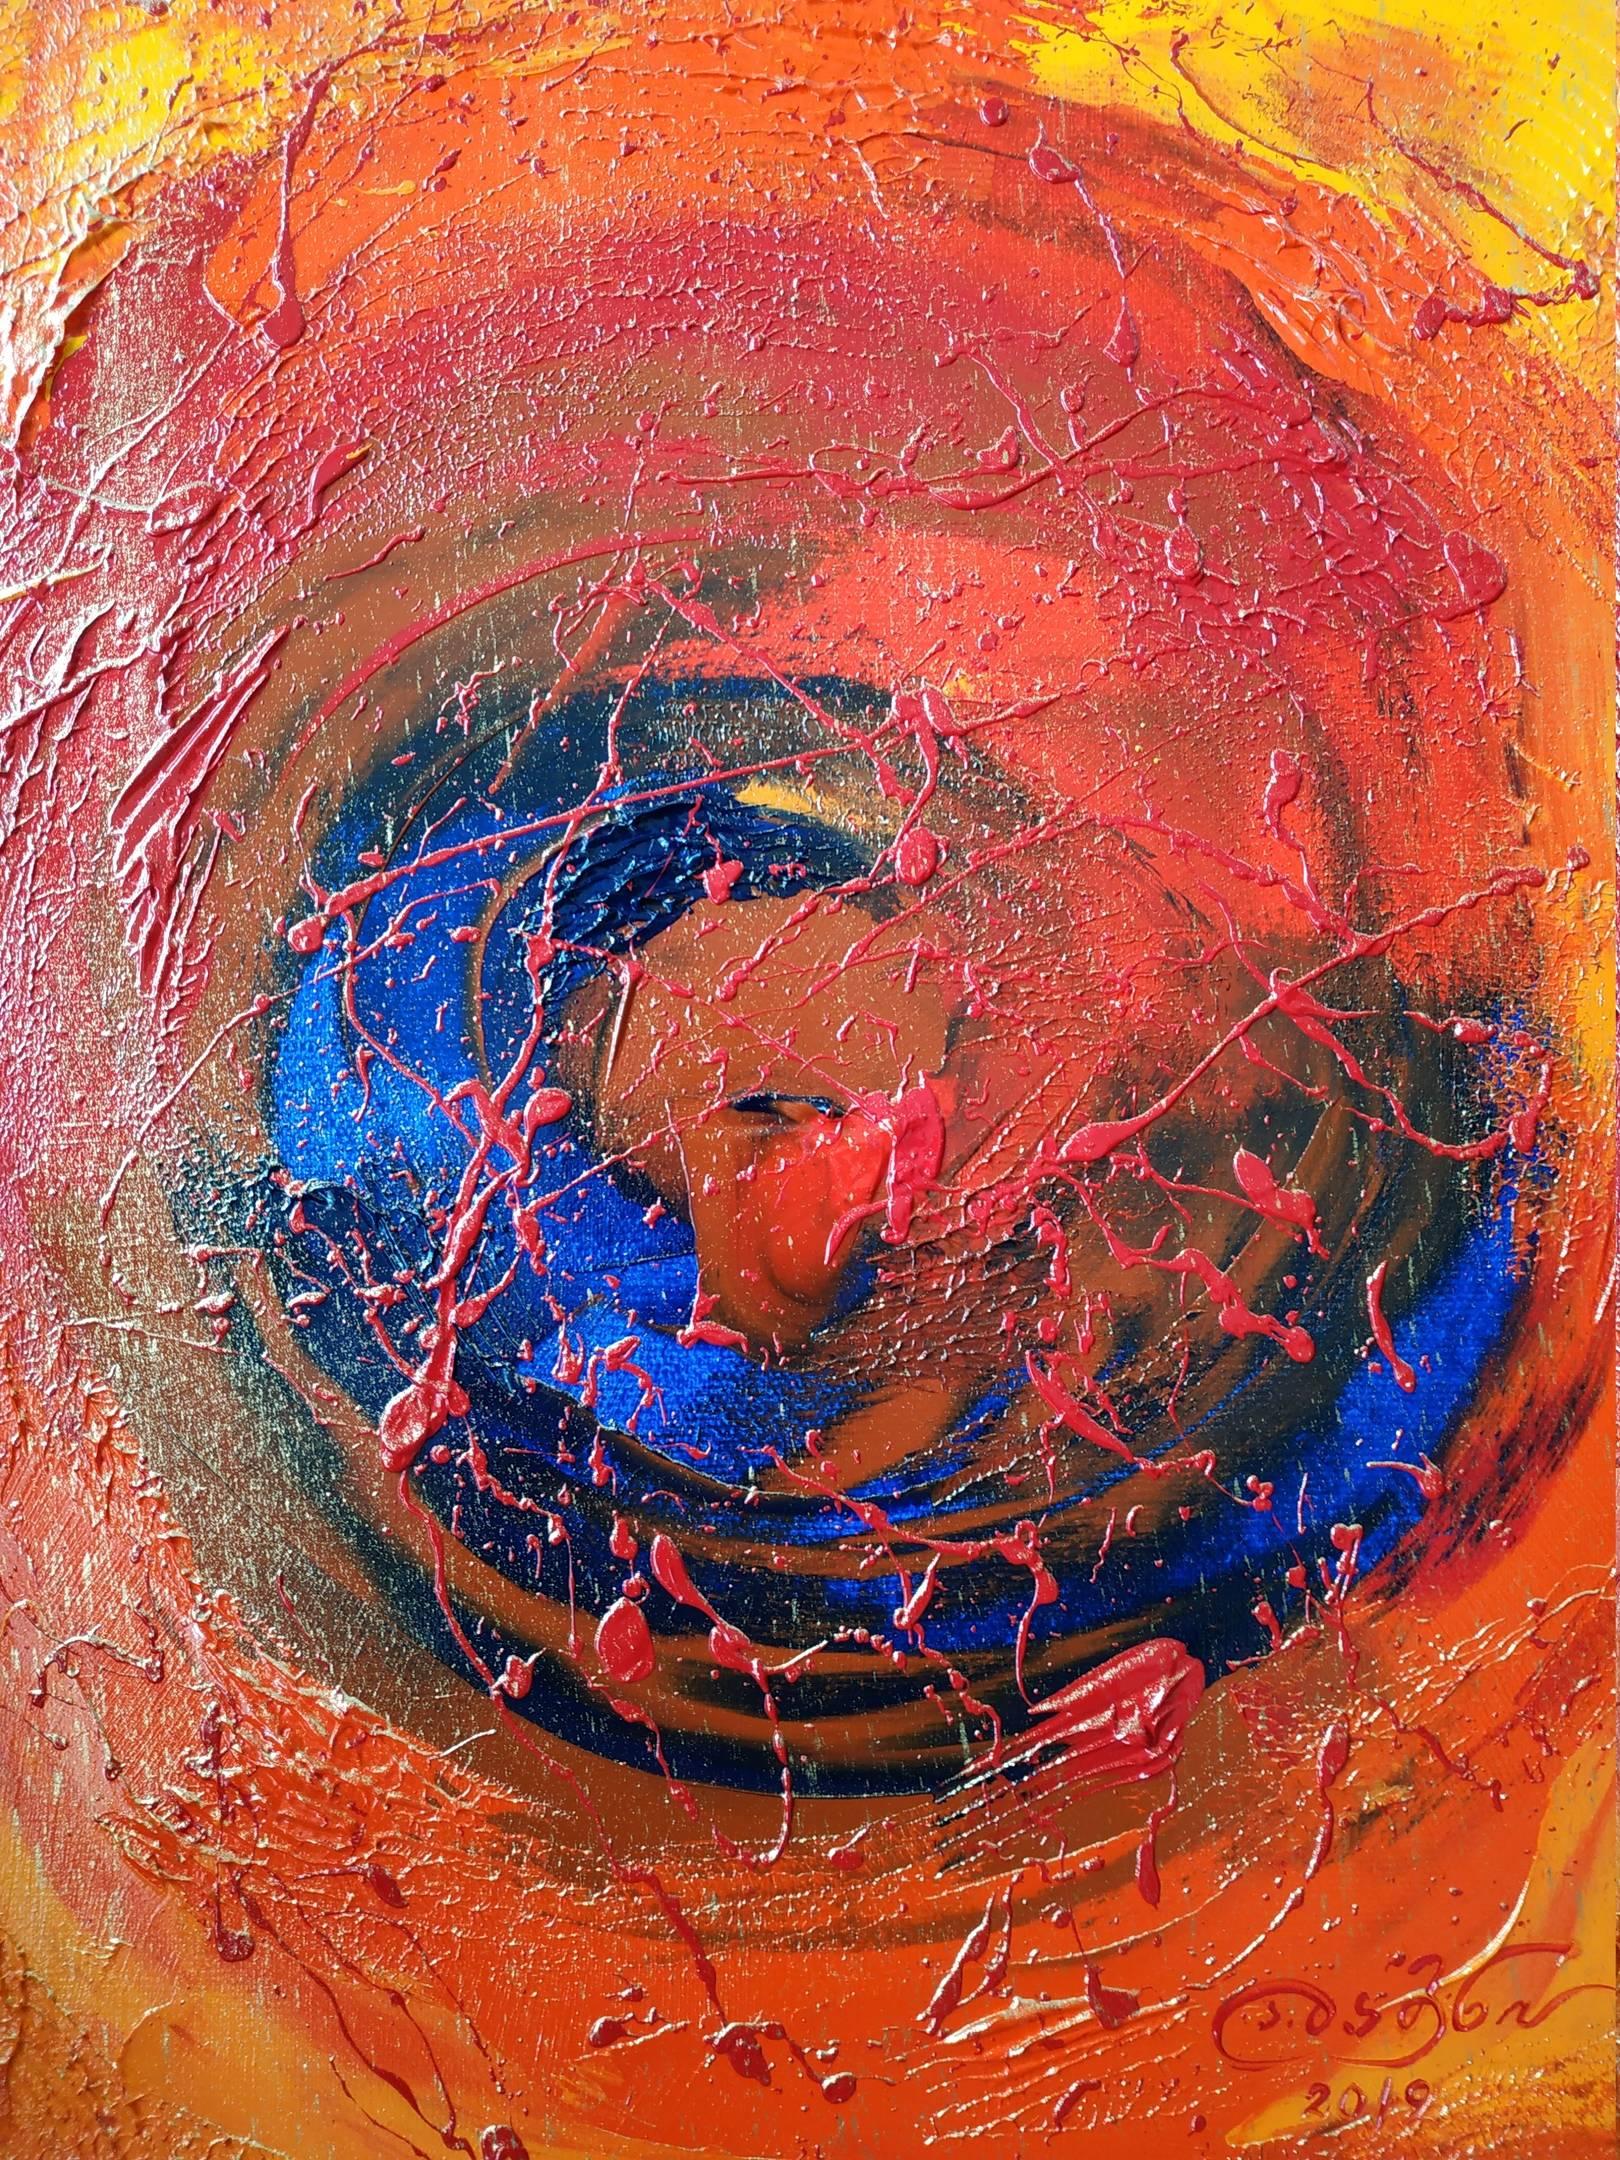 «Глаз красной луны»  холст, масло «Eye of the red moon»  oil on canvas  40x30,  2019